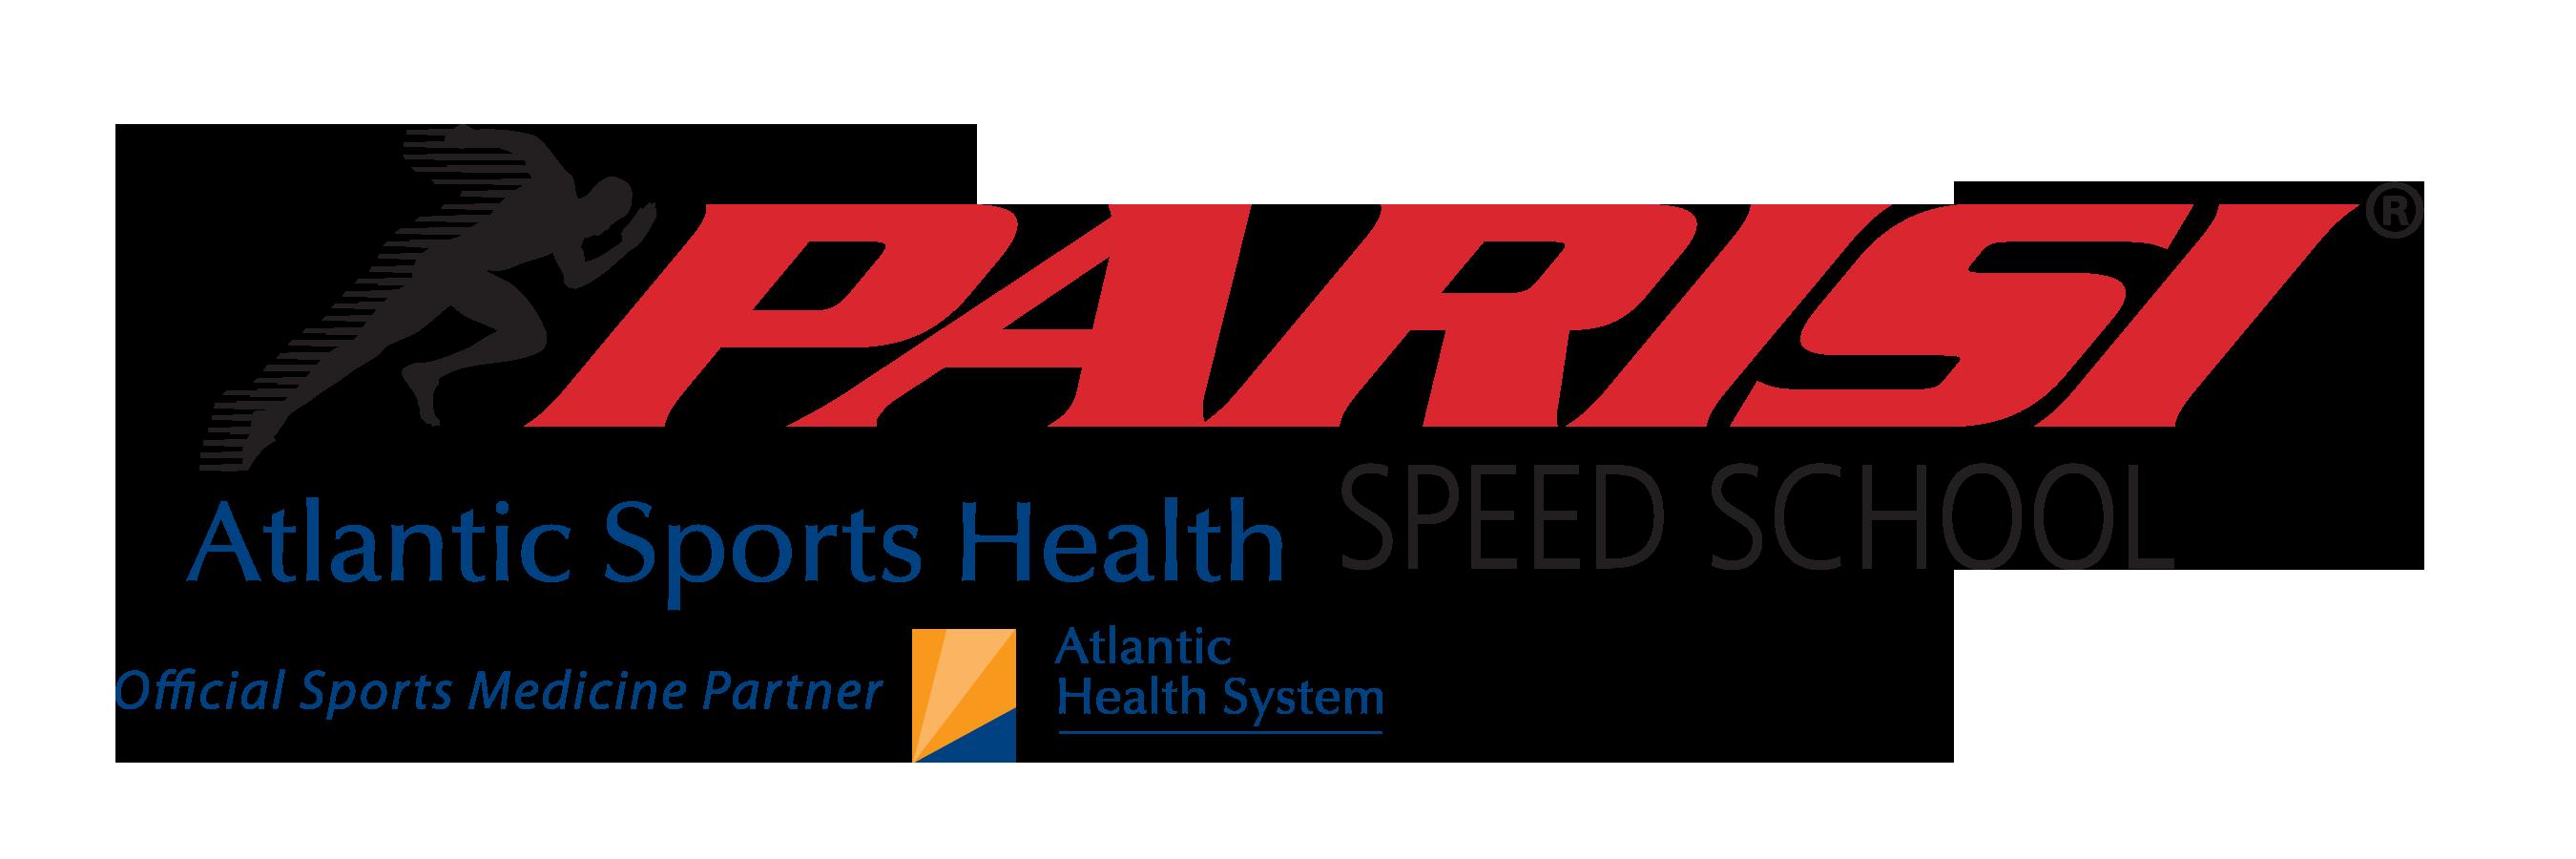 parisi with atlantic health logo